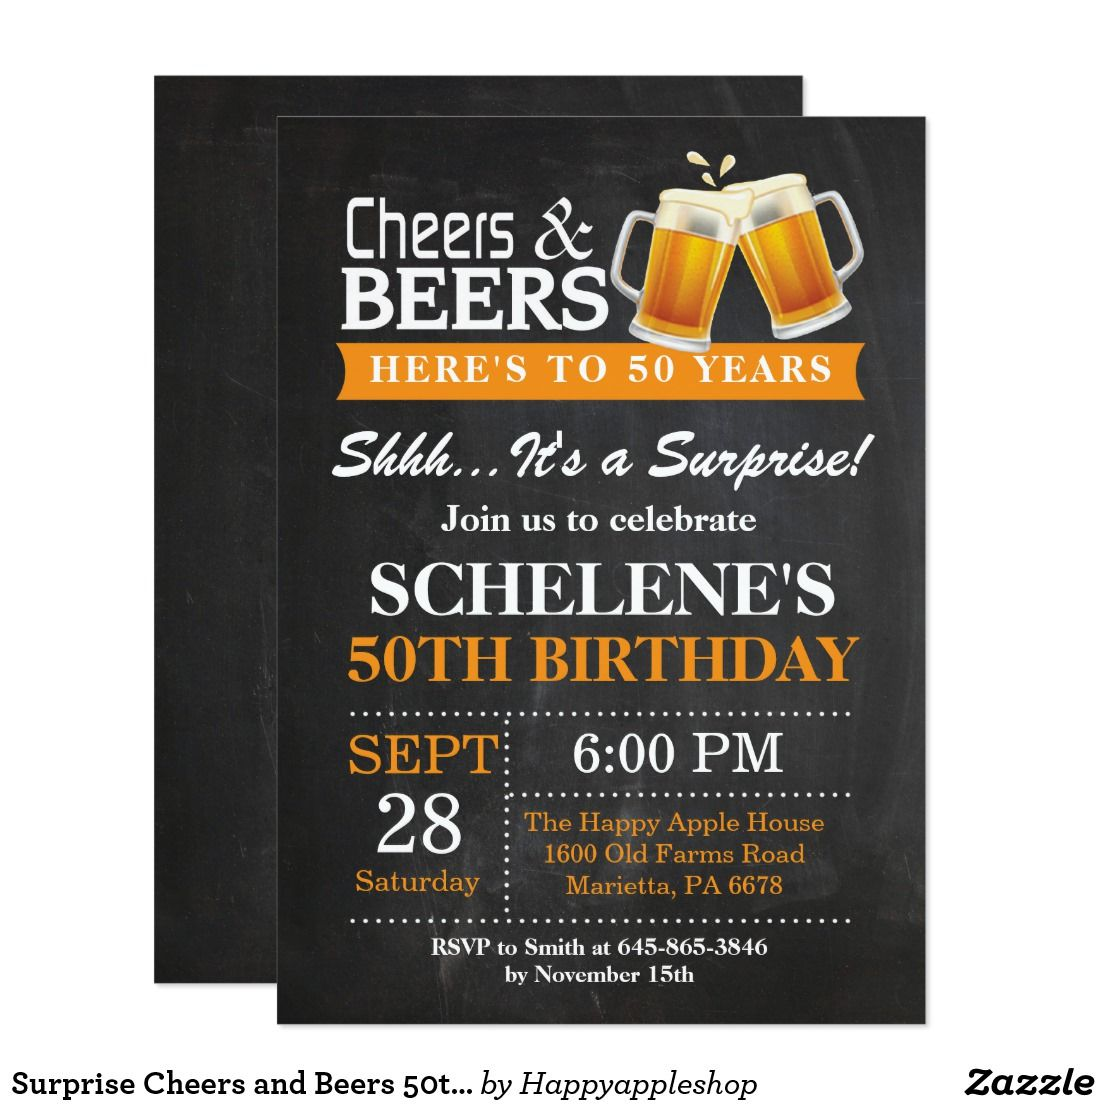 Surprise cheers and beers 50th birthday invitation birthday bash surprise cheers and beers 50th birthday invitation stopboris Gallery